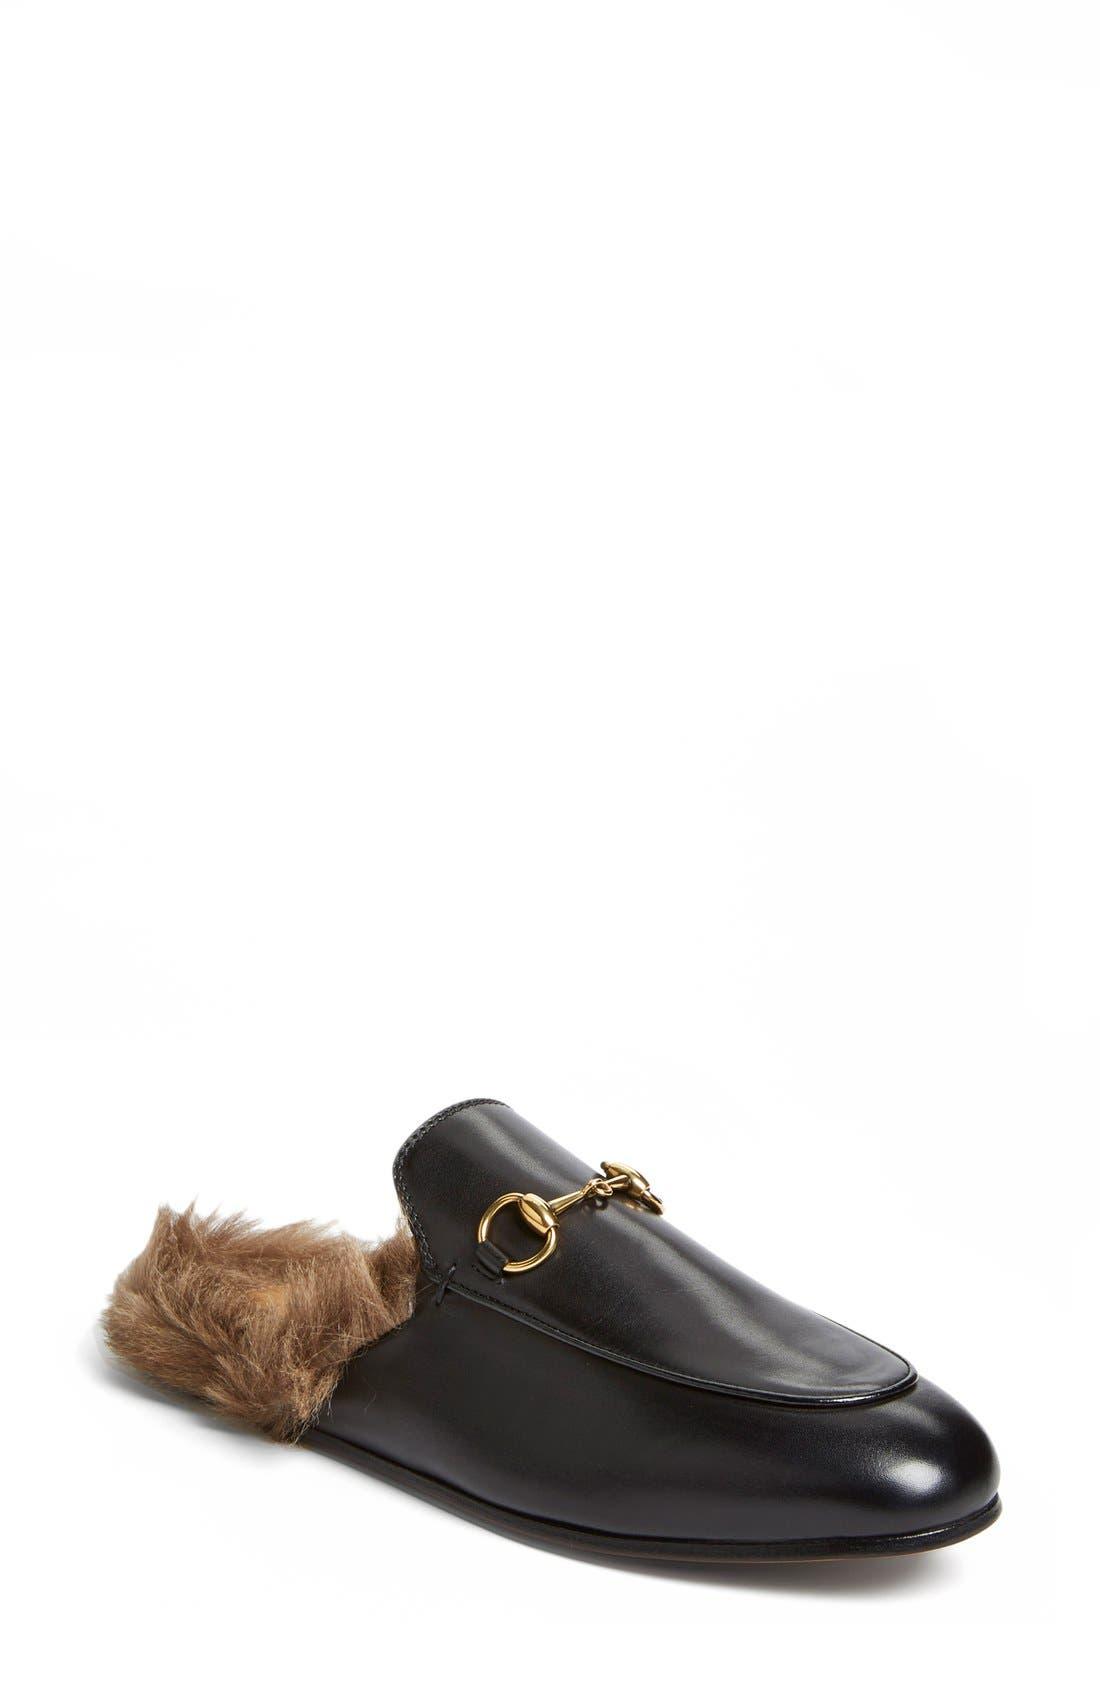 Main Image - Gucci Princetown Genuine Shearling Loafer Mule (Women)